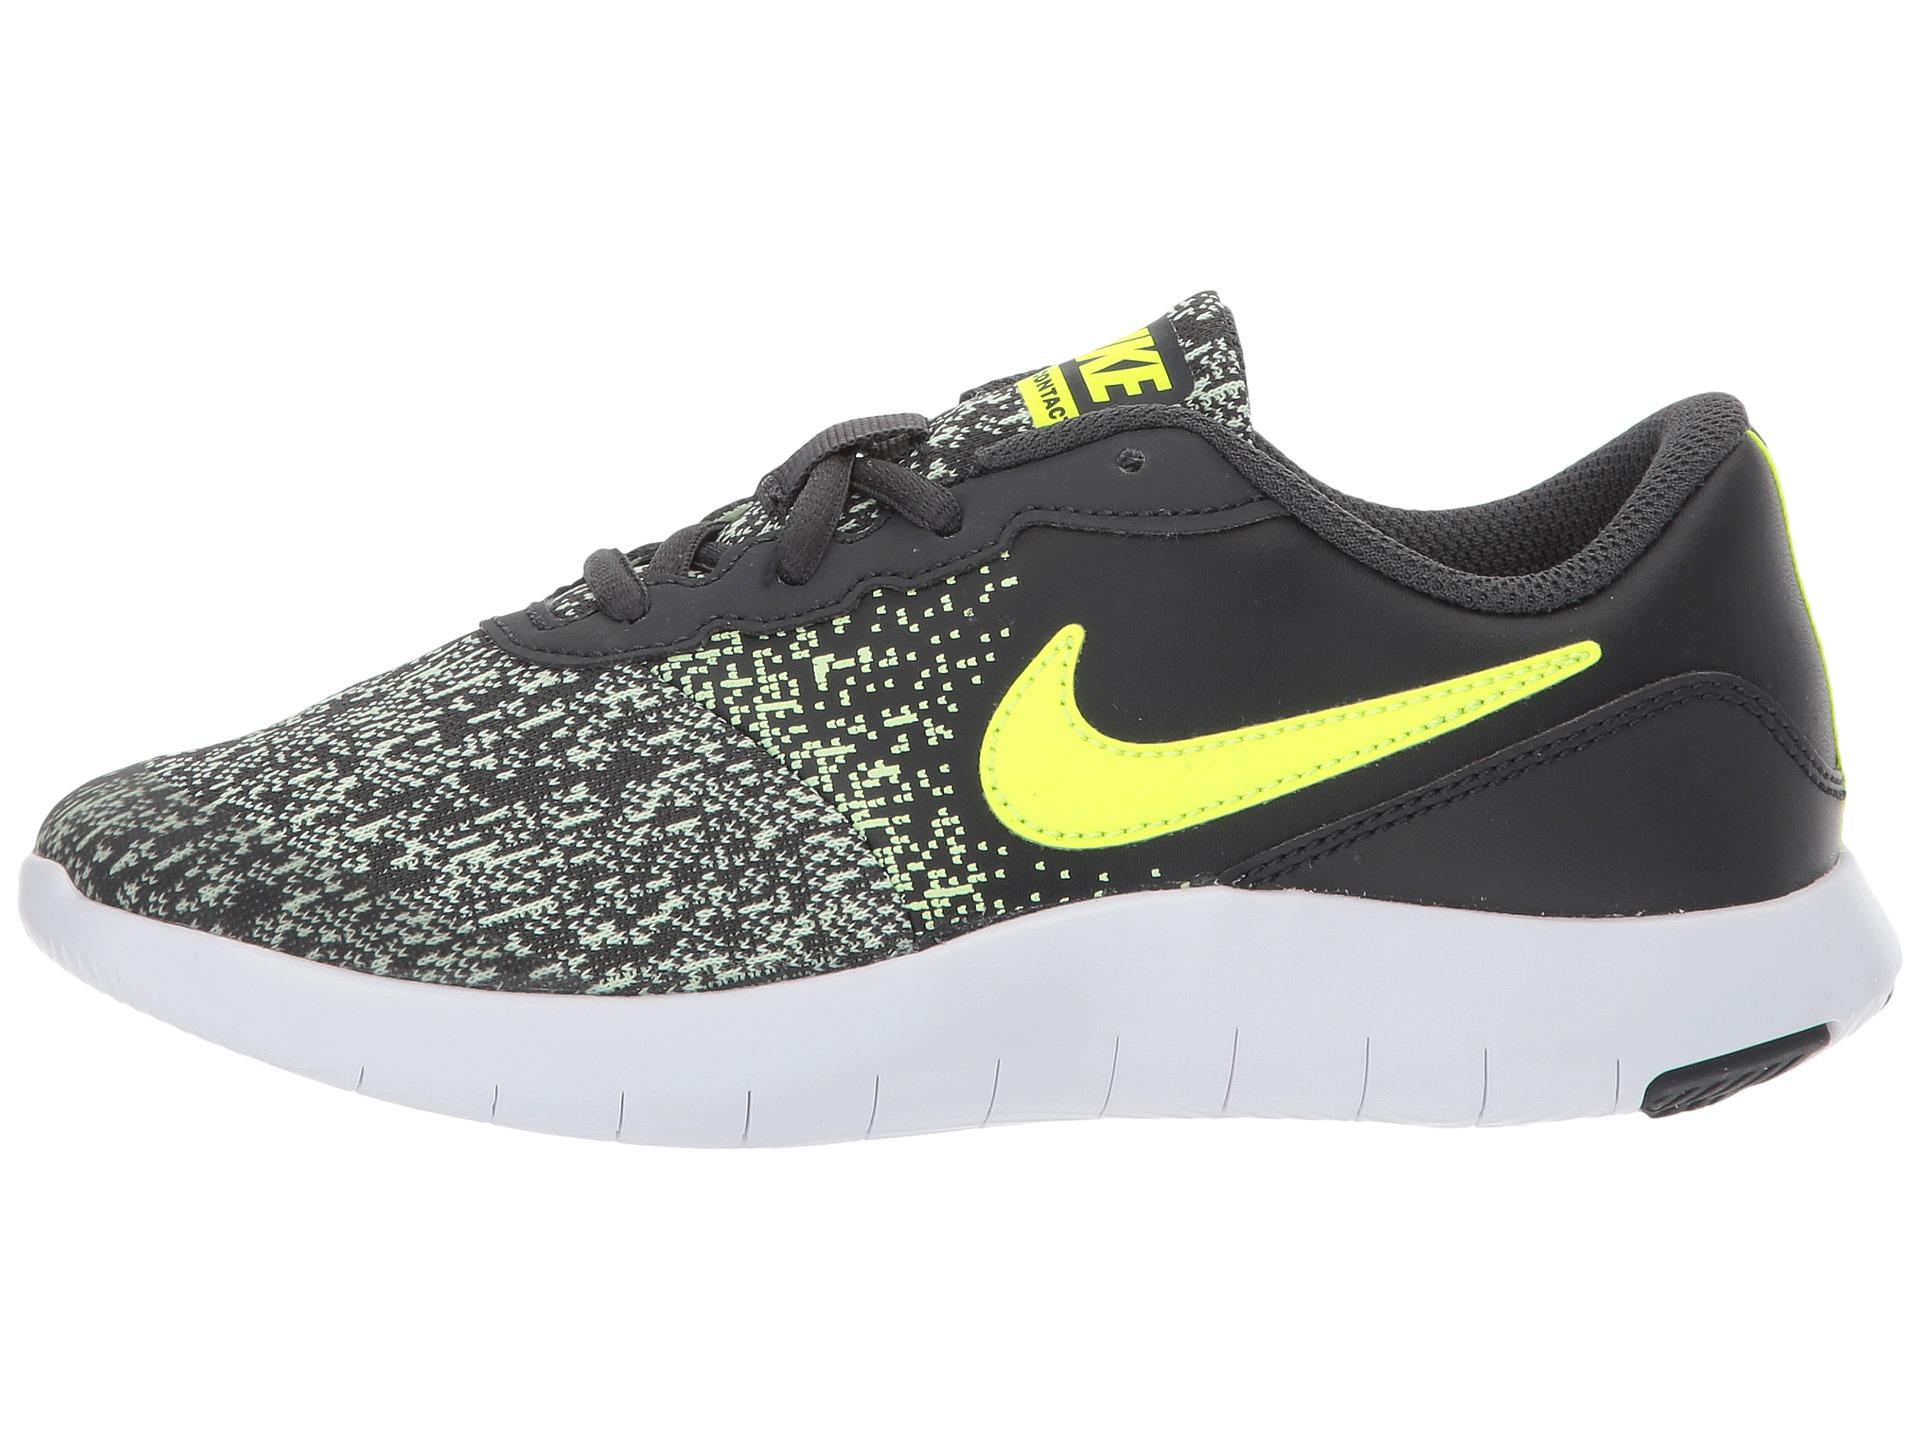 eccf0ea72c2e8 Zalora Nike Dunk Shoe For Boys